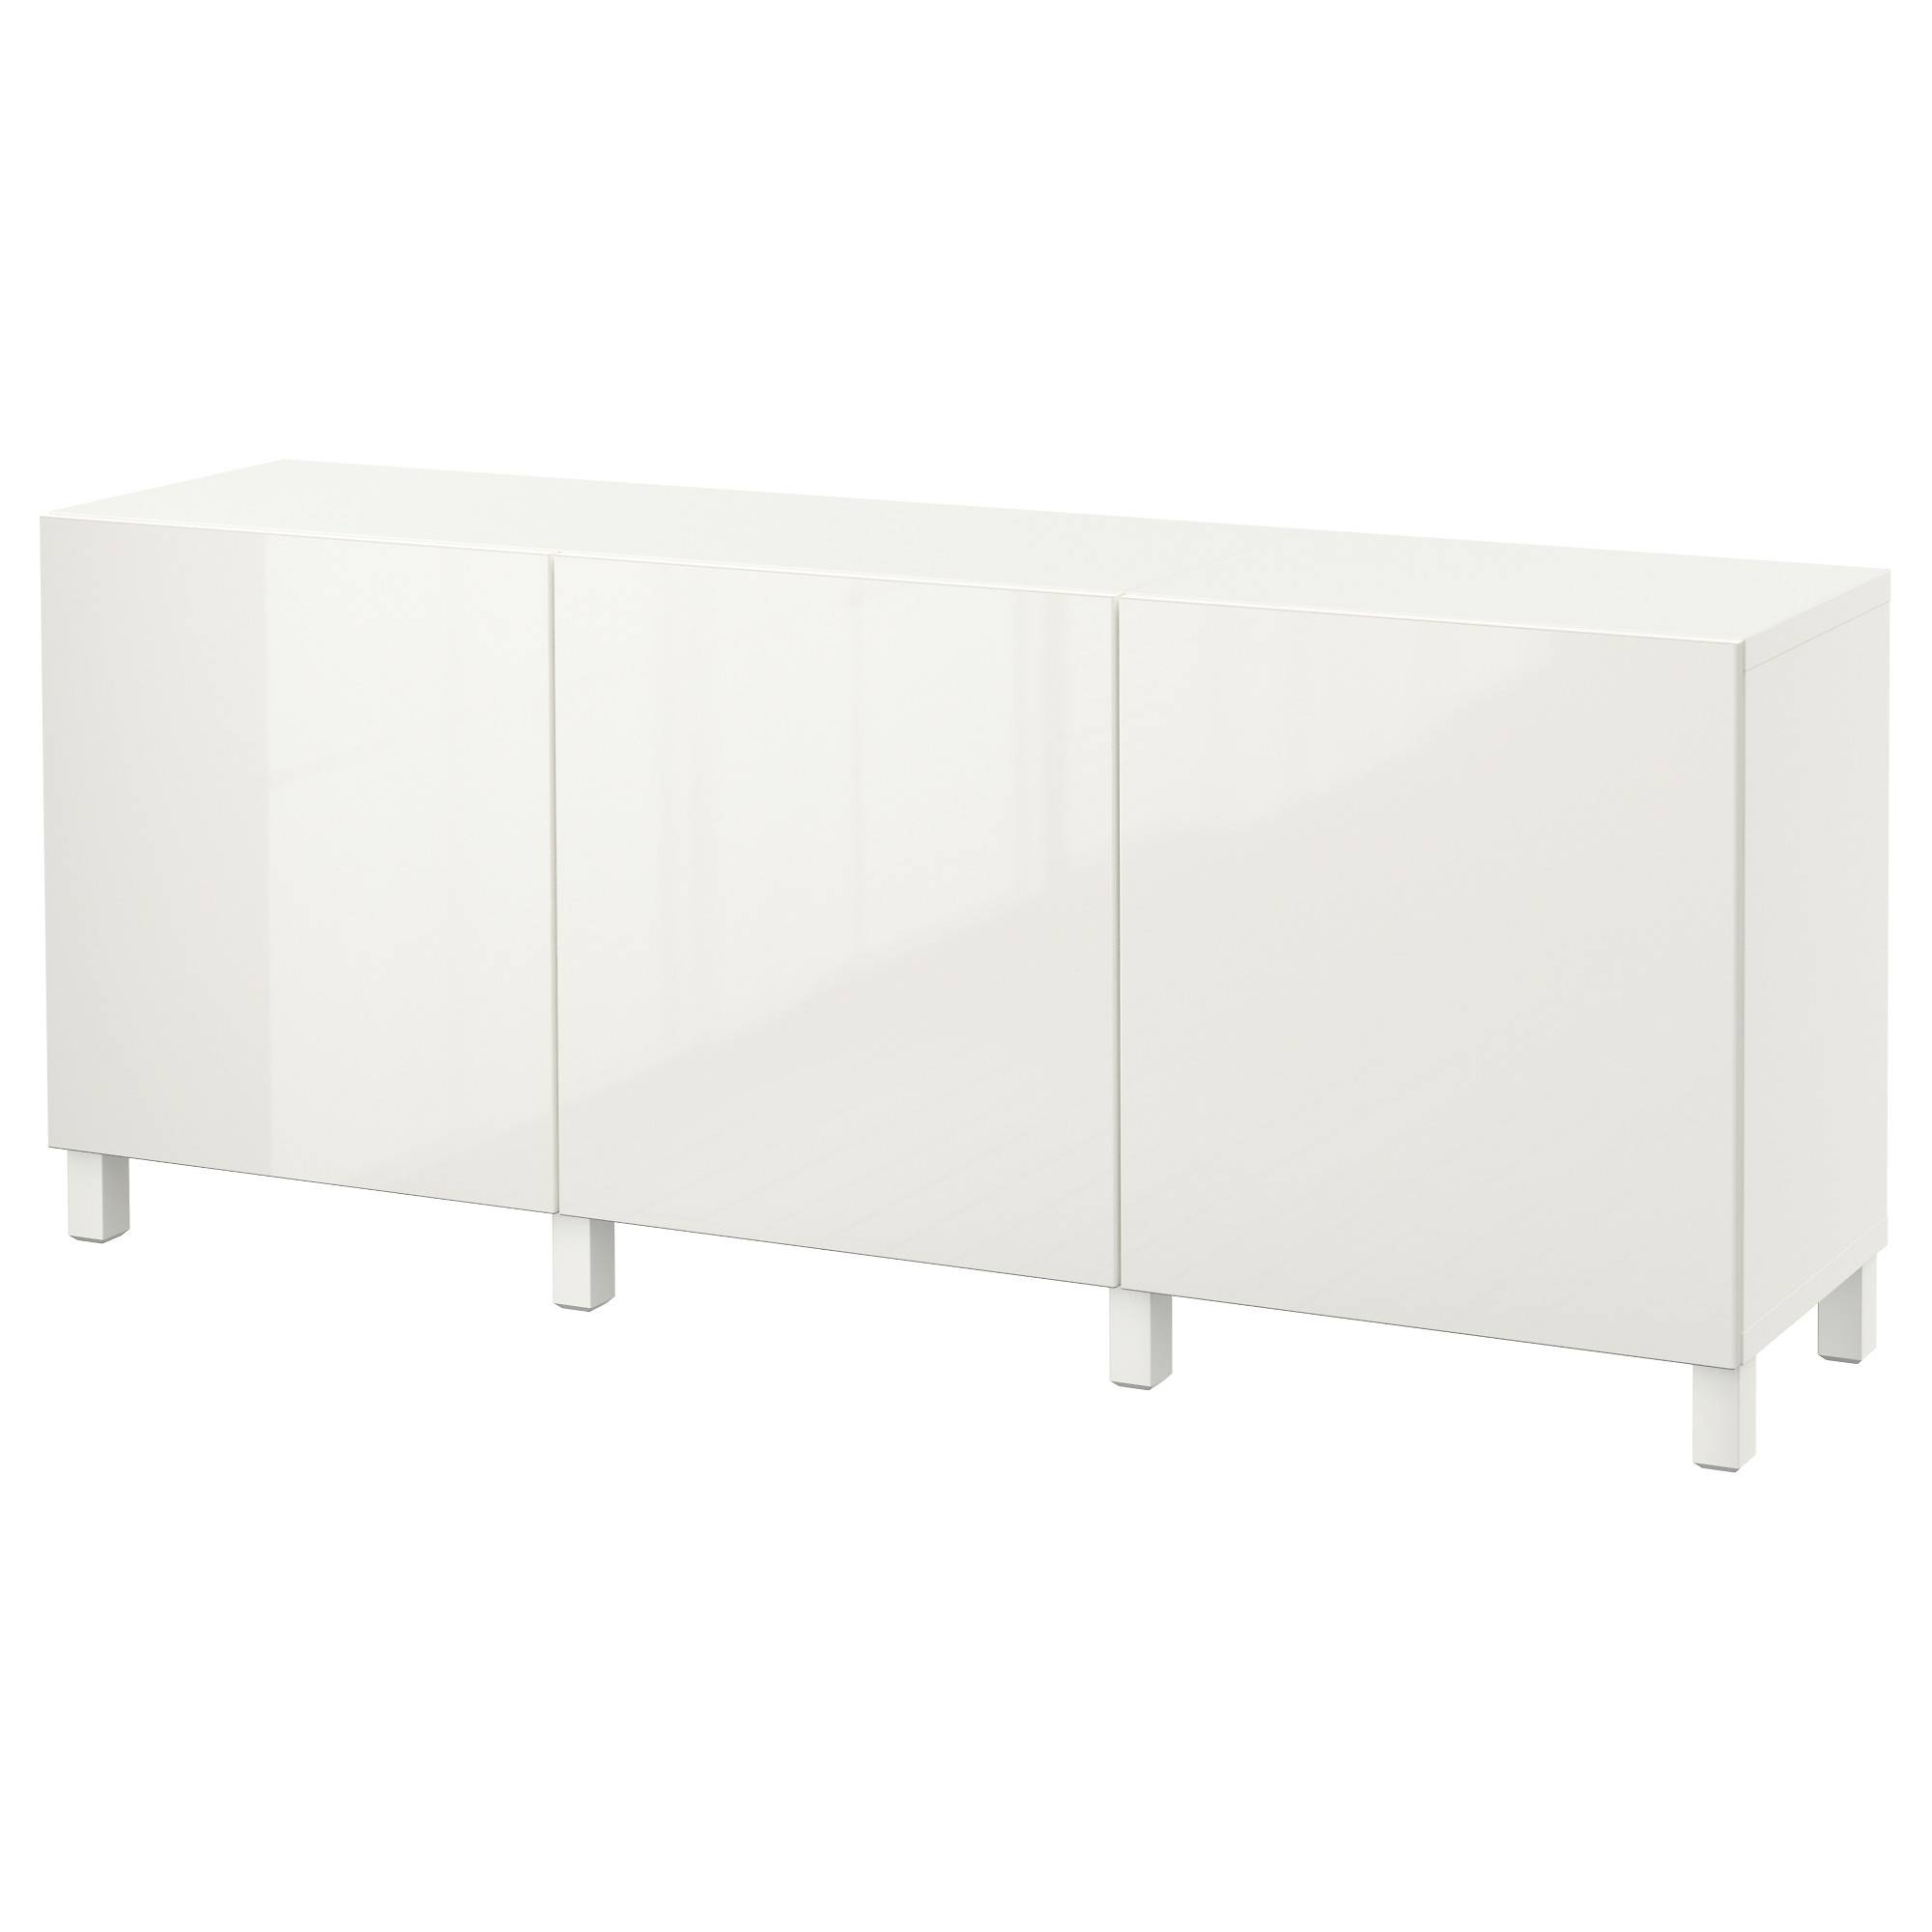 Buffet Tables & Sideboards – Ikea Regarding Black Gloss Buffet Sideboards (#2 of 15)